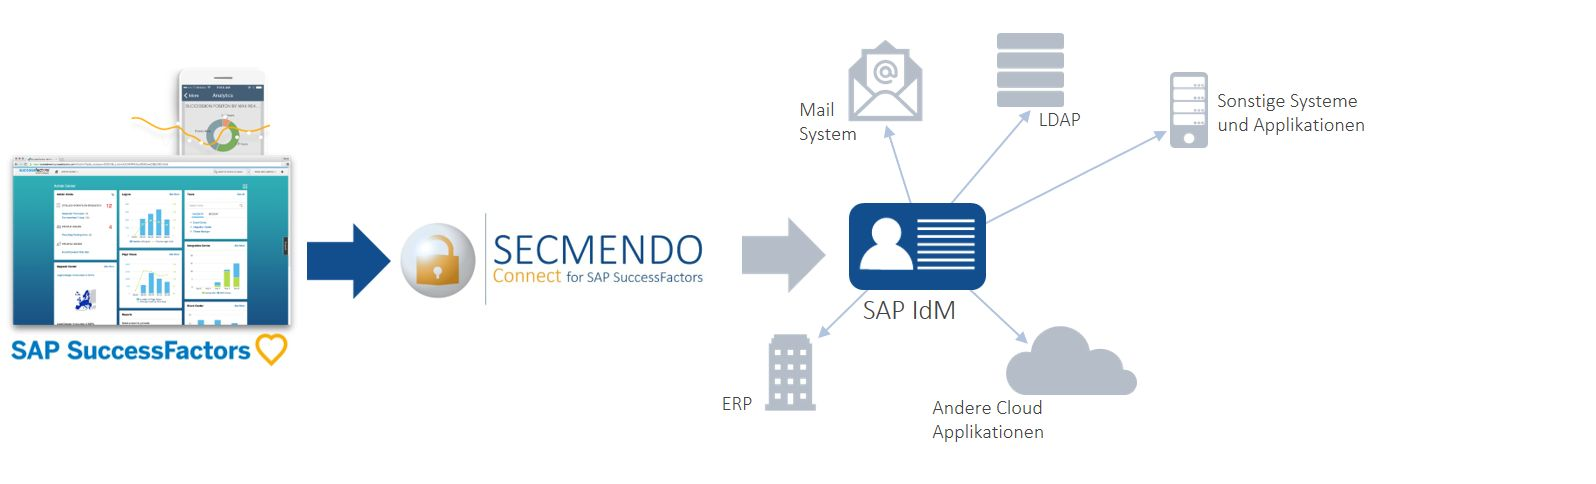 SECMENDO.connect for SuccessFactors DE